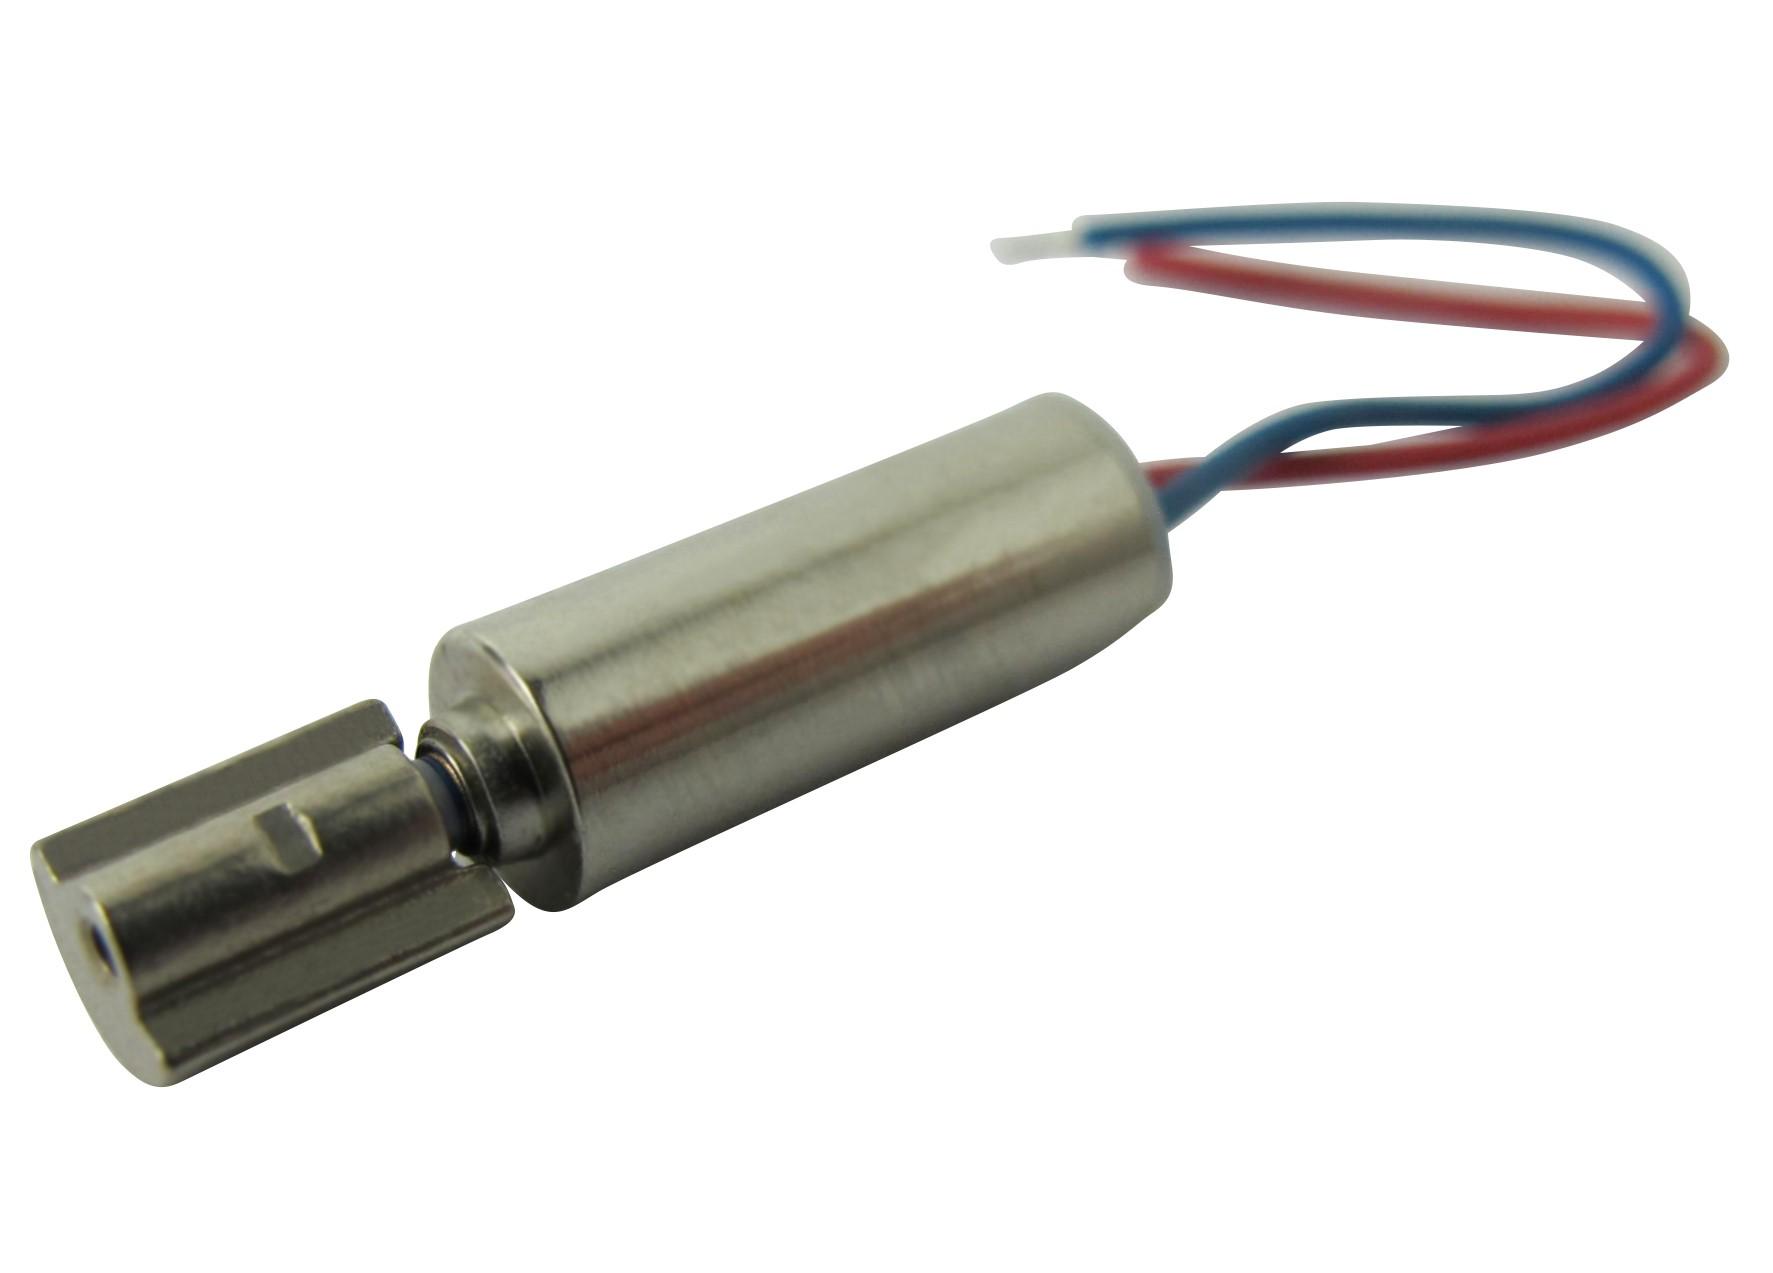 Z4SL2A0280001 Cylindrical Vibrator Motor